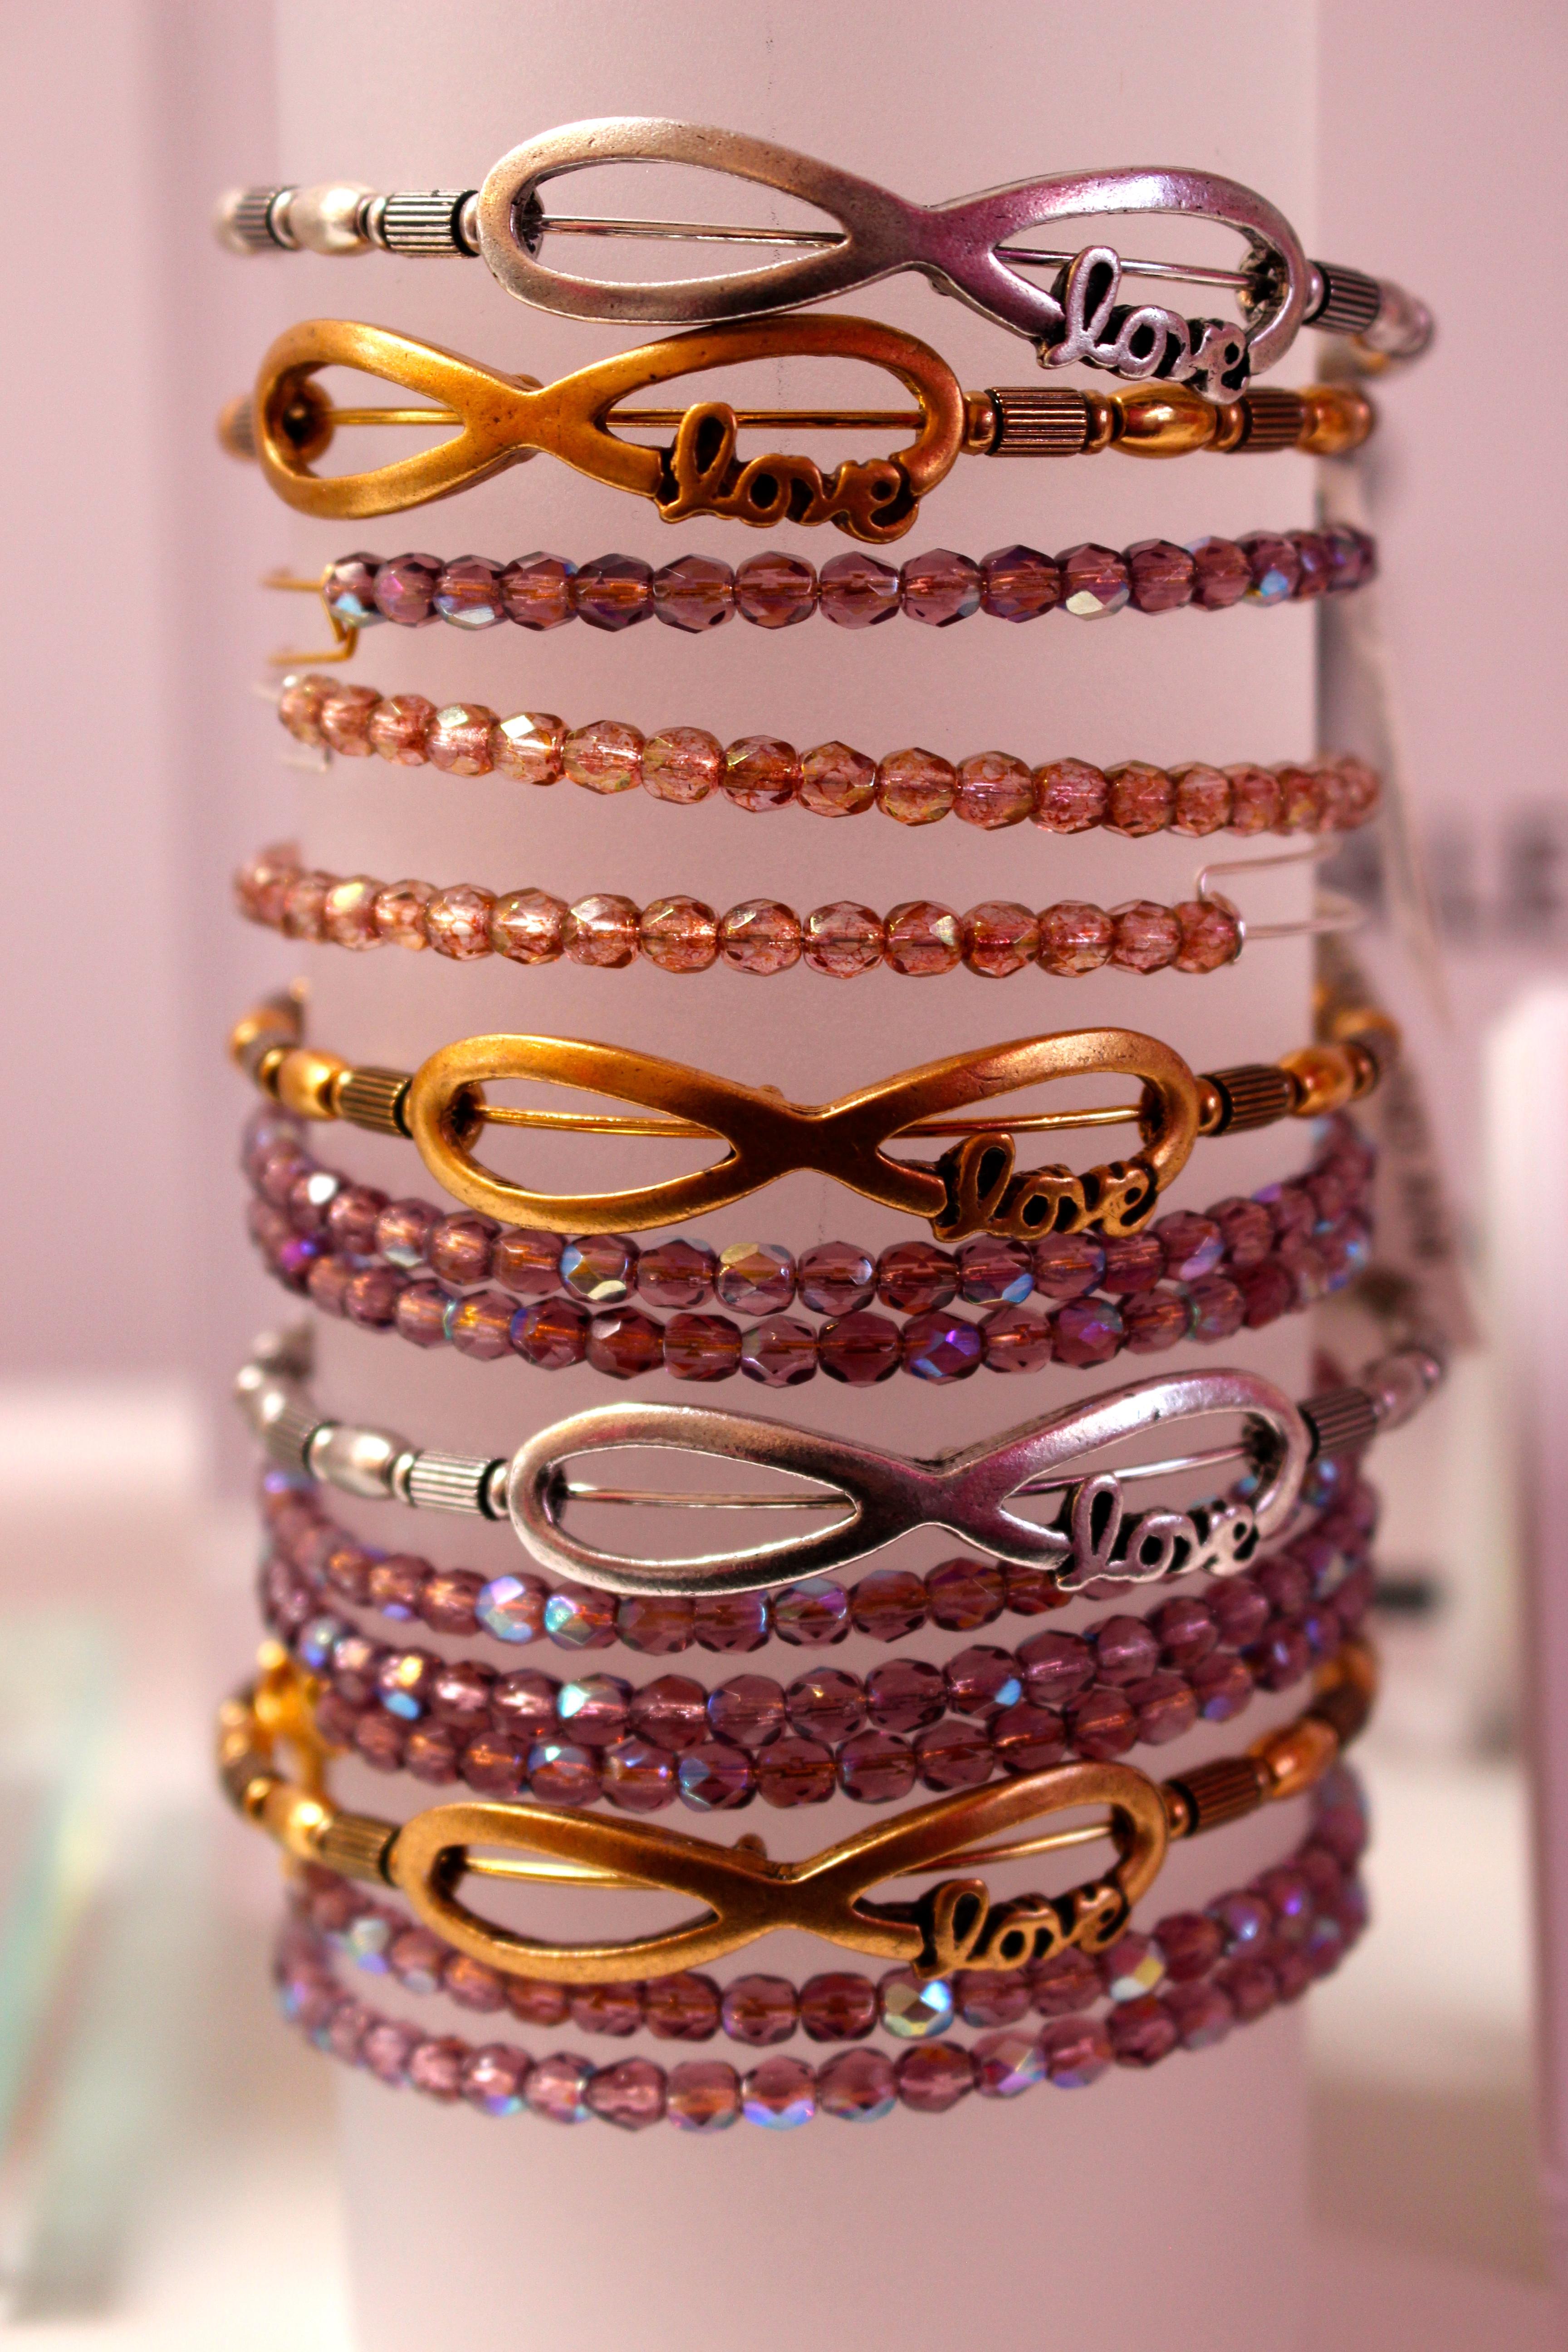 Valentine's day gift bracelets